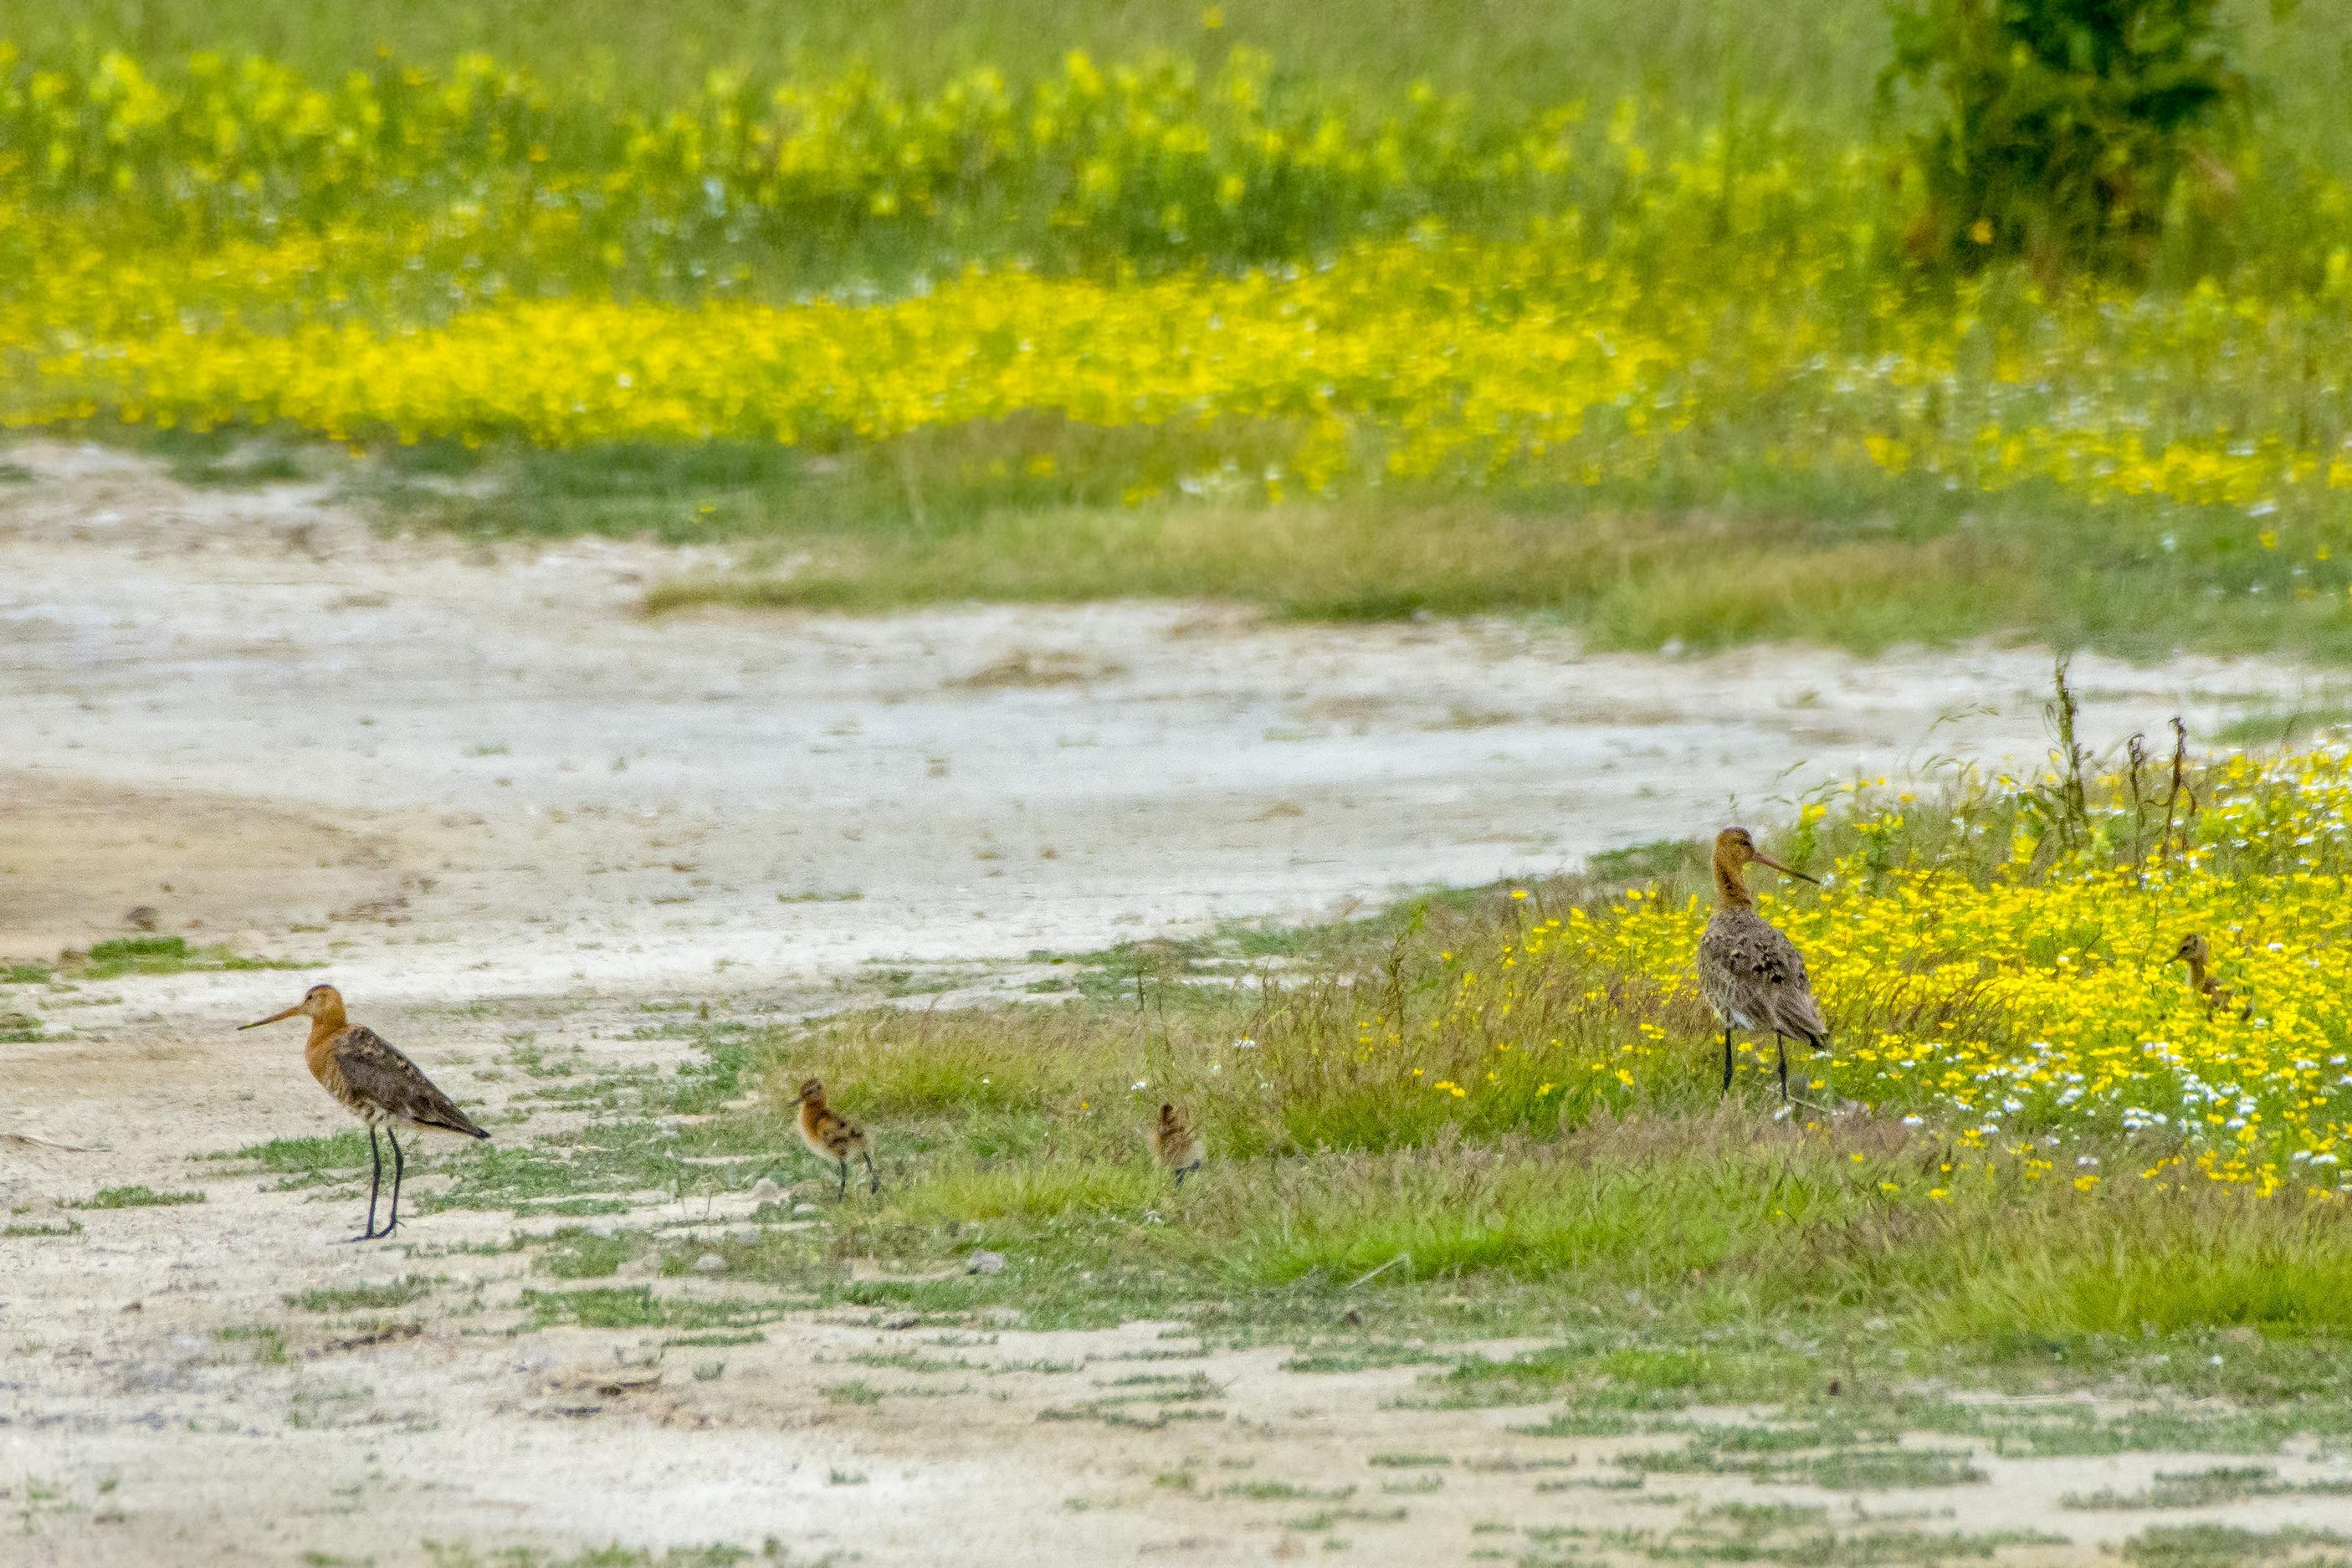 Maaiblunder in Waalenburg leidt tot verontwaardiging Texelse vogelliefhebbers